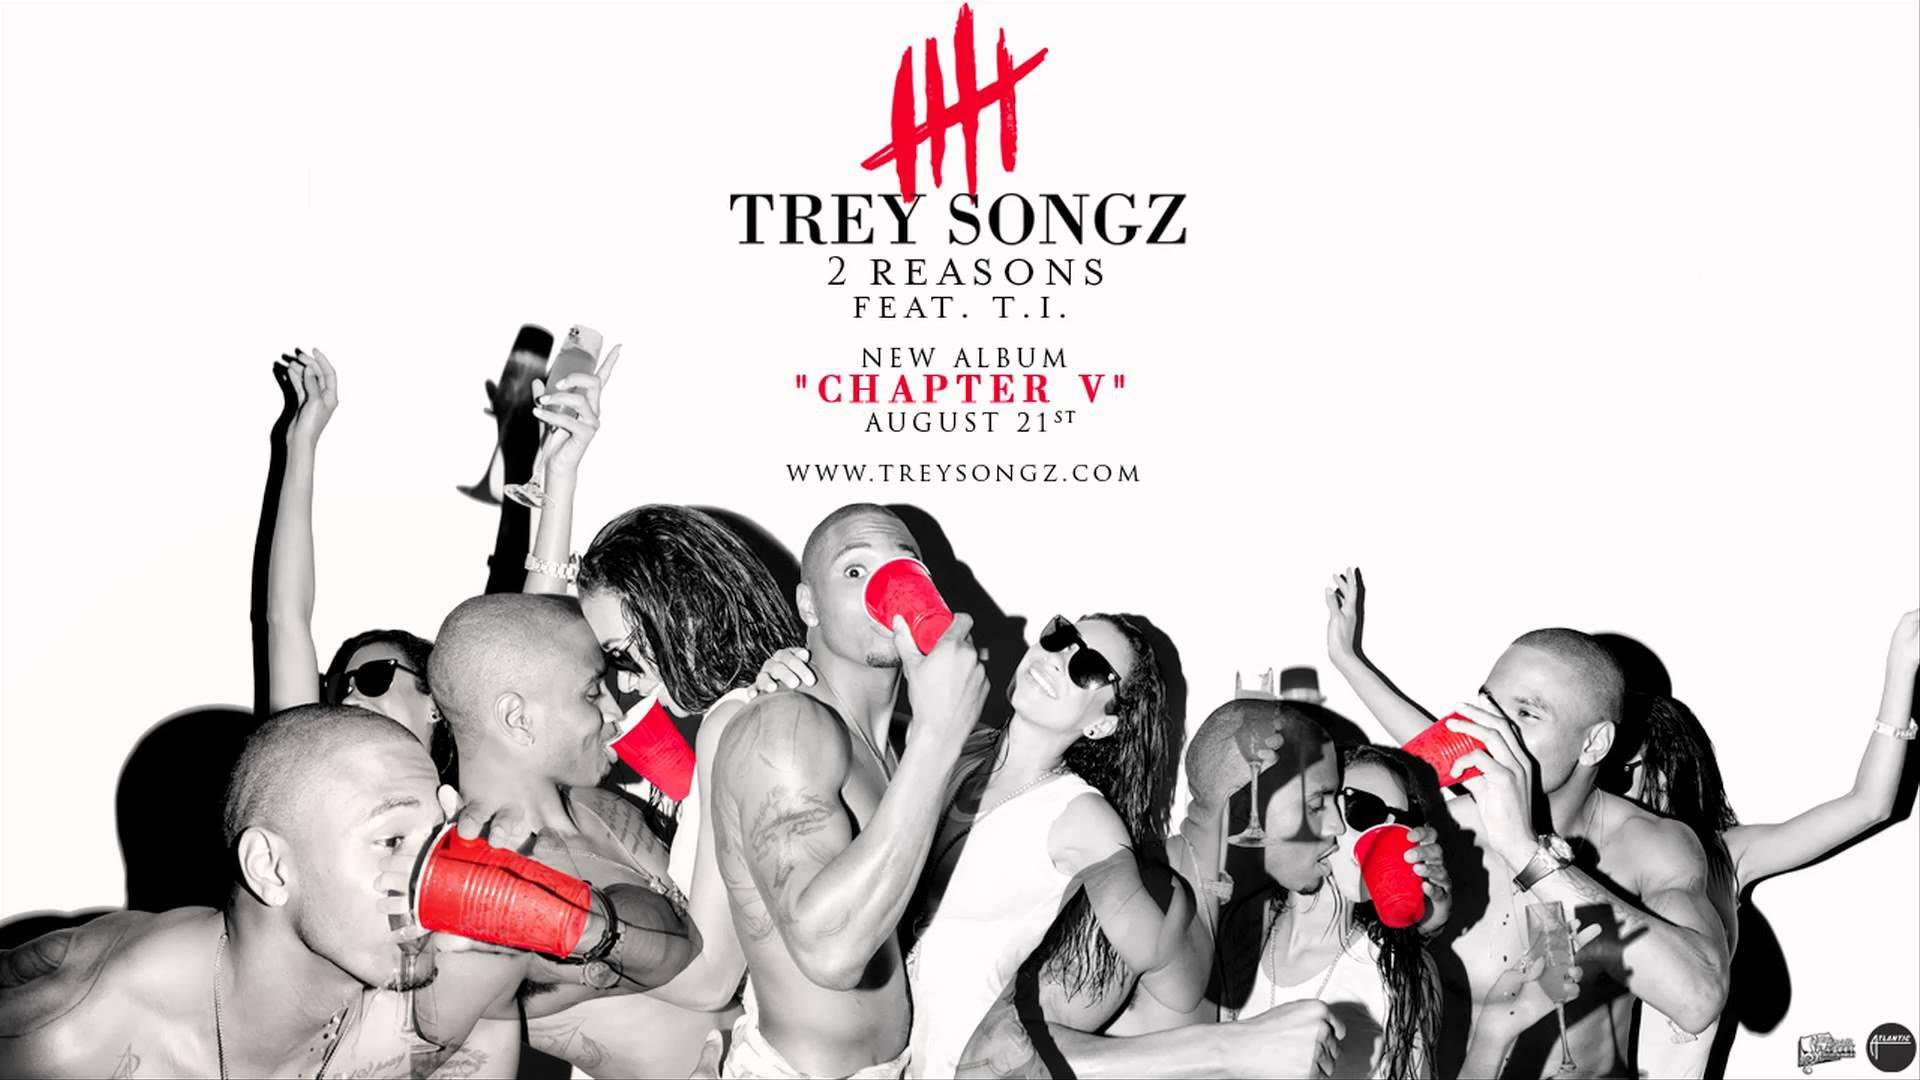 trey songz discography torrent kickass